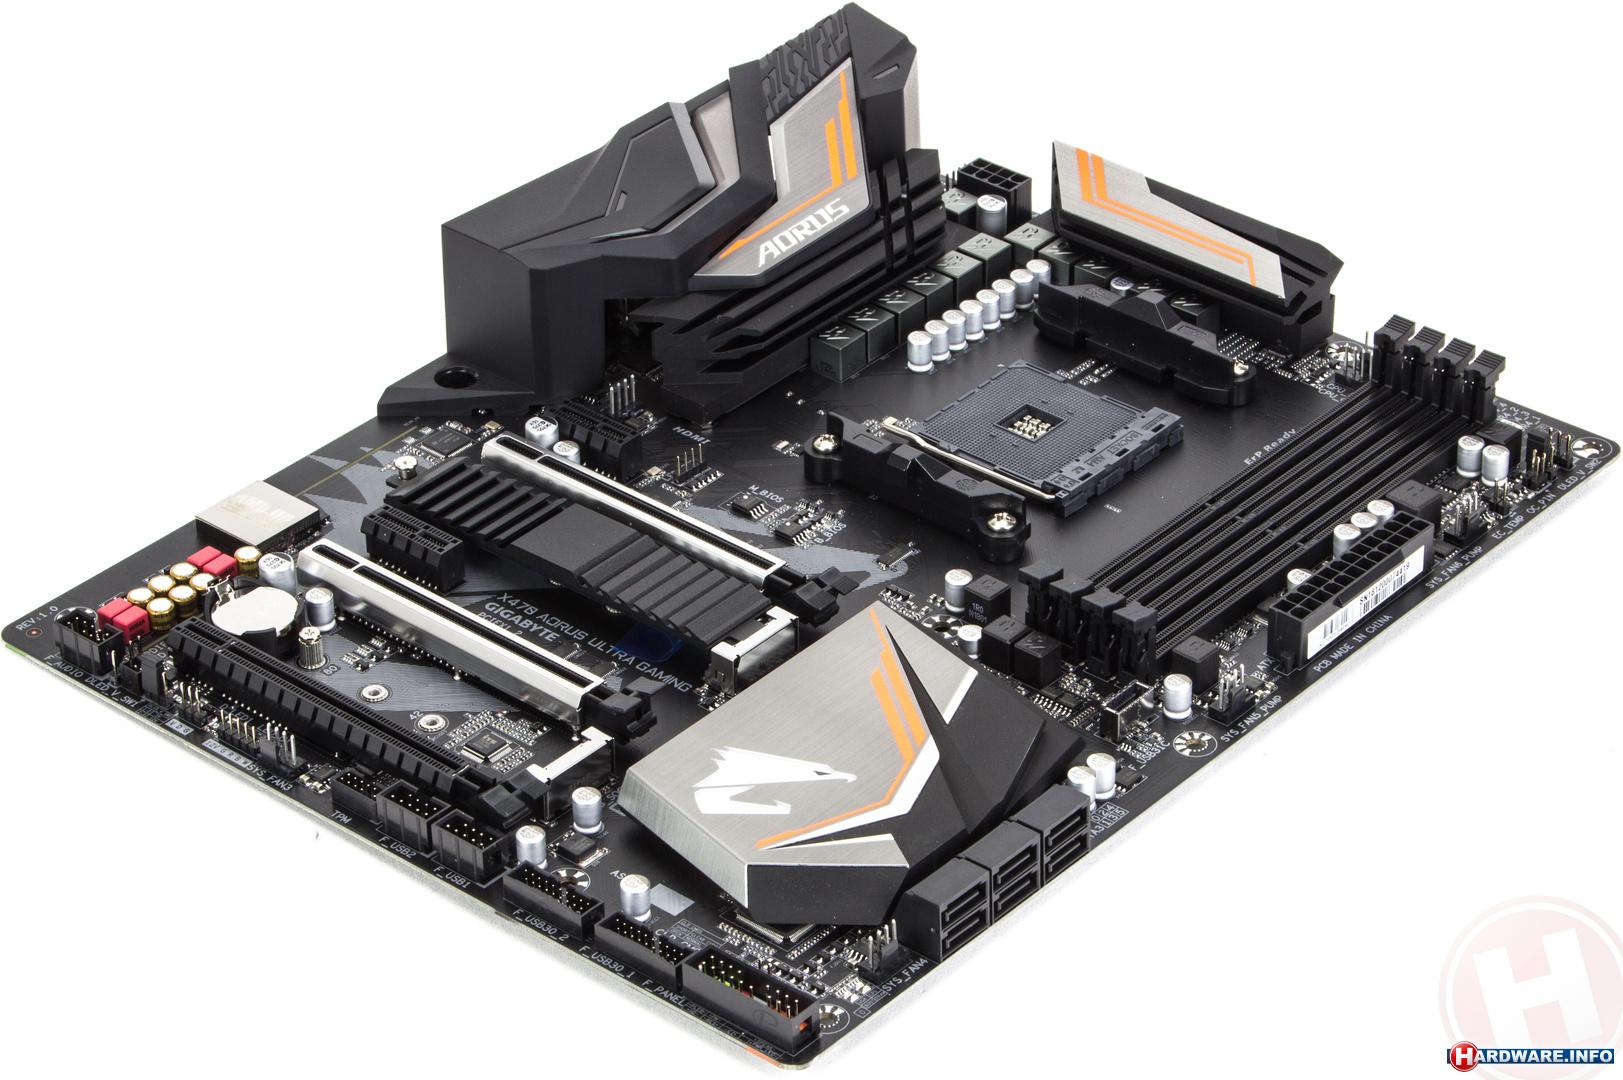 Gigabyte X470 Aorus Ultra Gaming moederbord - Hardware Info